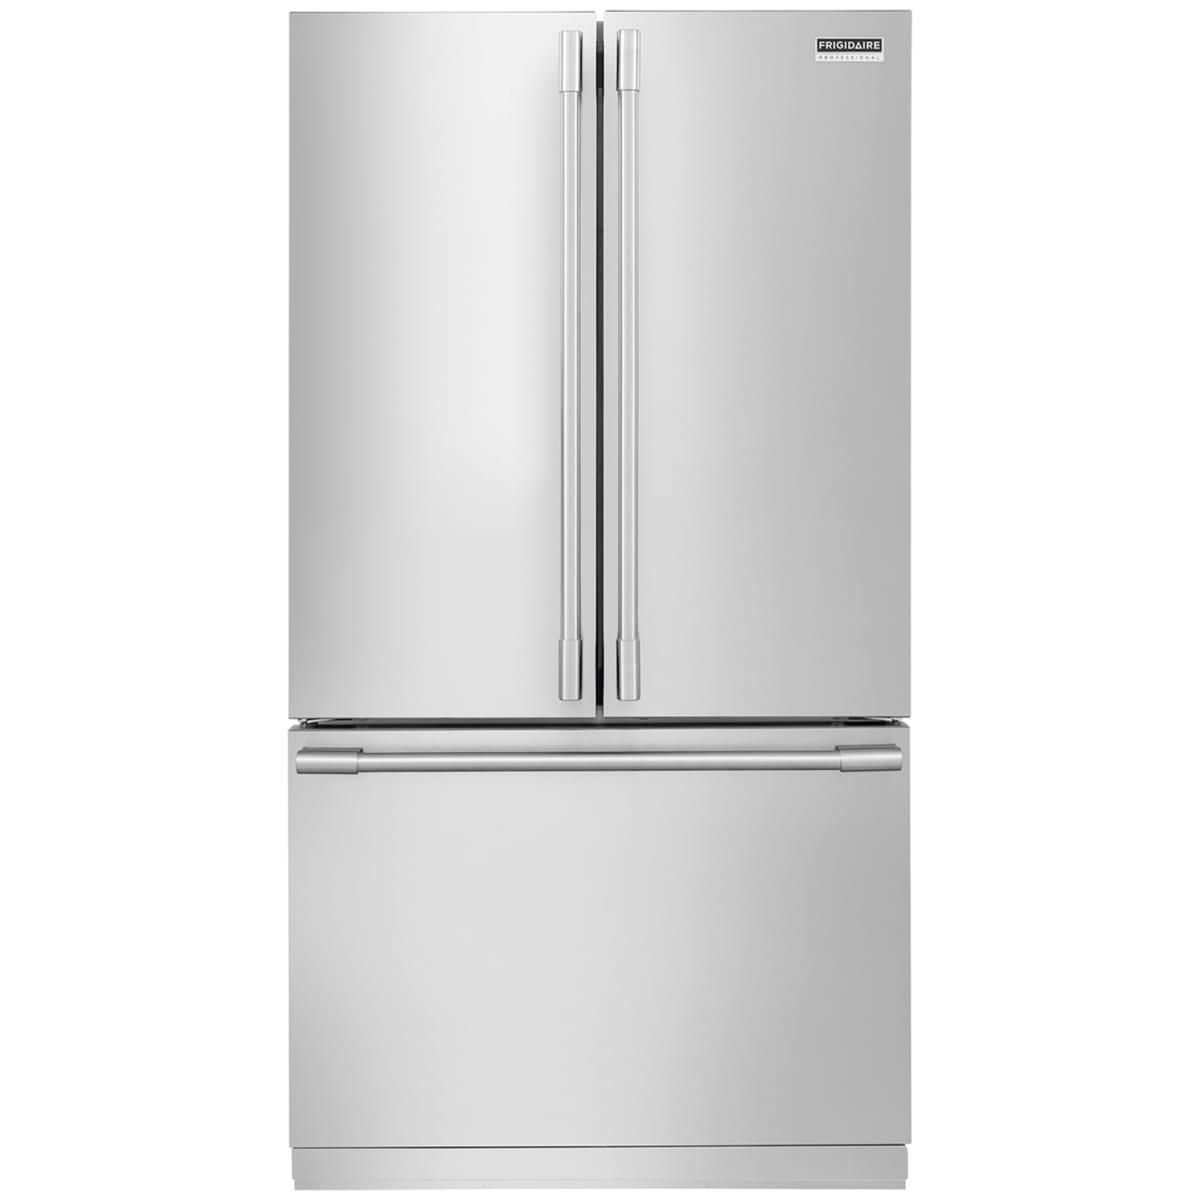 Frigidaire French Door Refrigerators Fpbg2277r Avanti Refrigerator Wiring Diagram